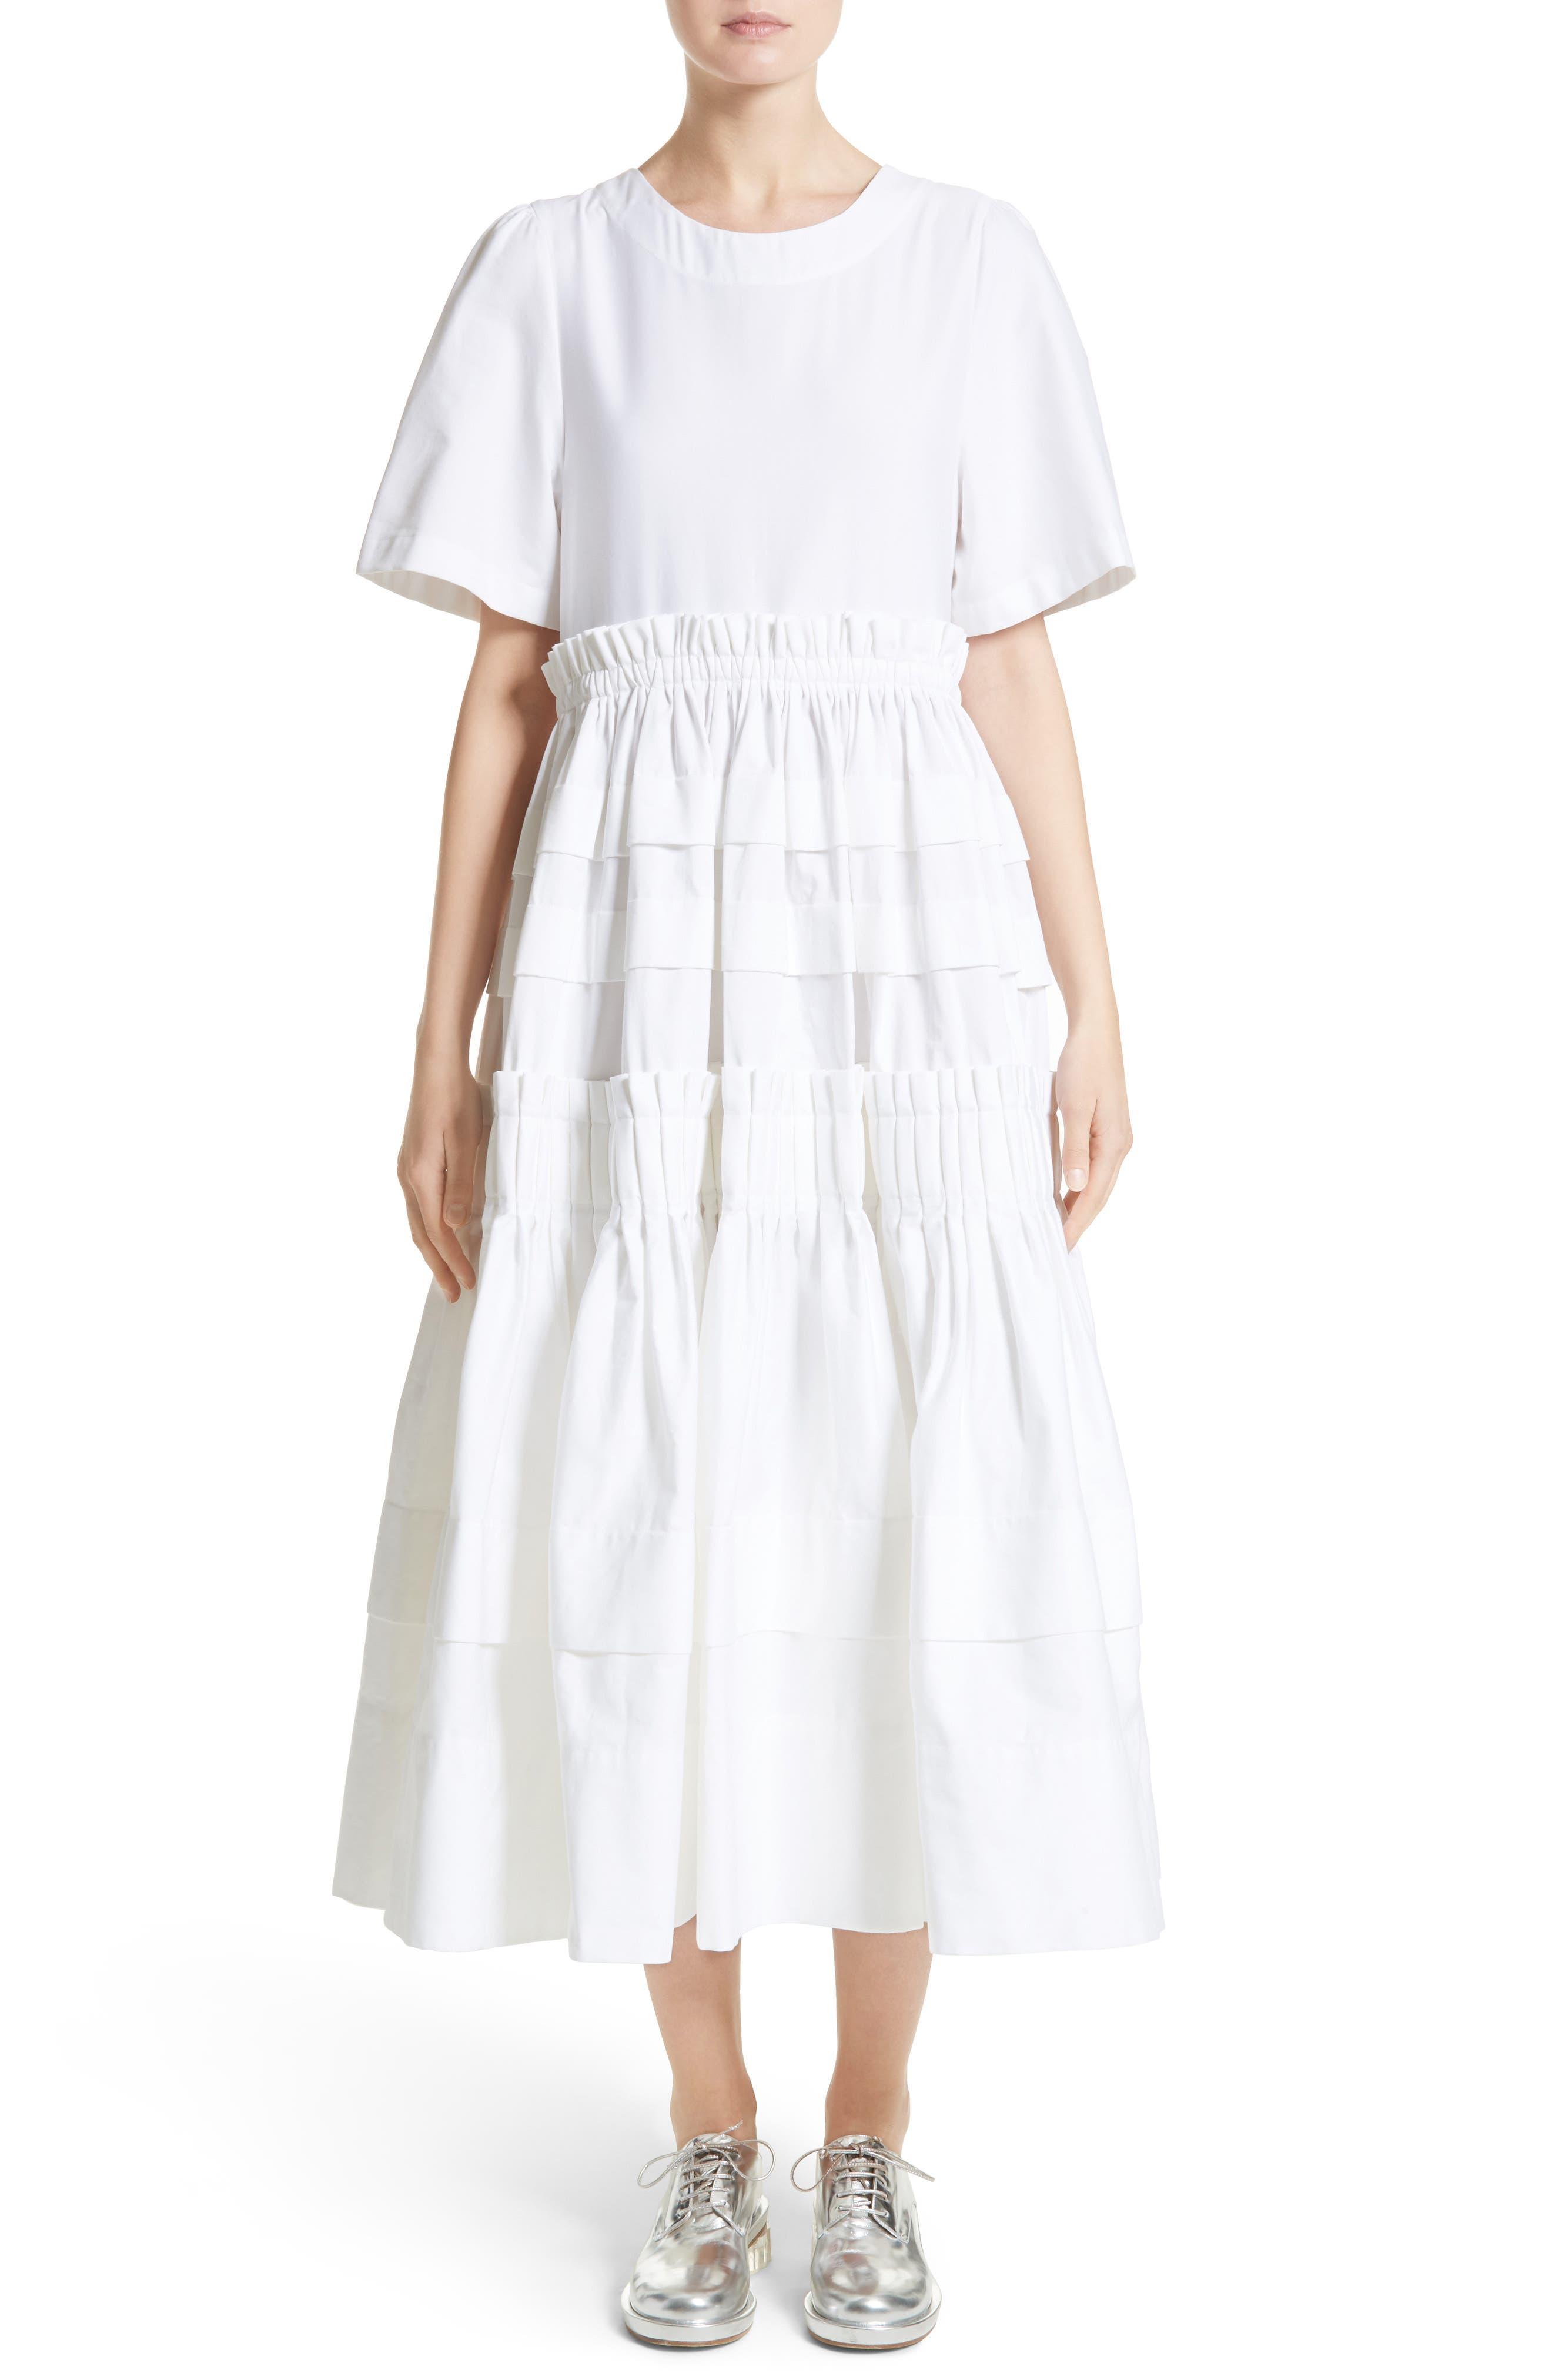 Main Image - Molly Goddard Mathilda Maxi Dress